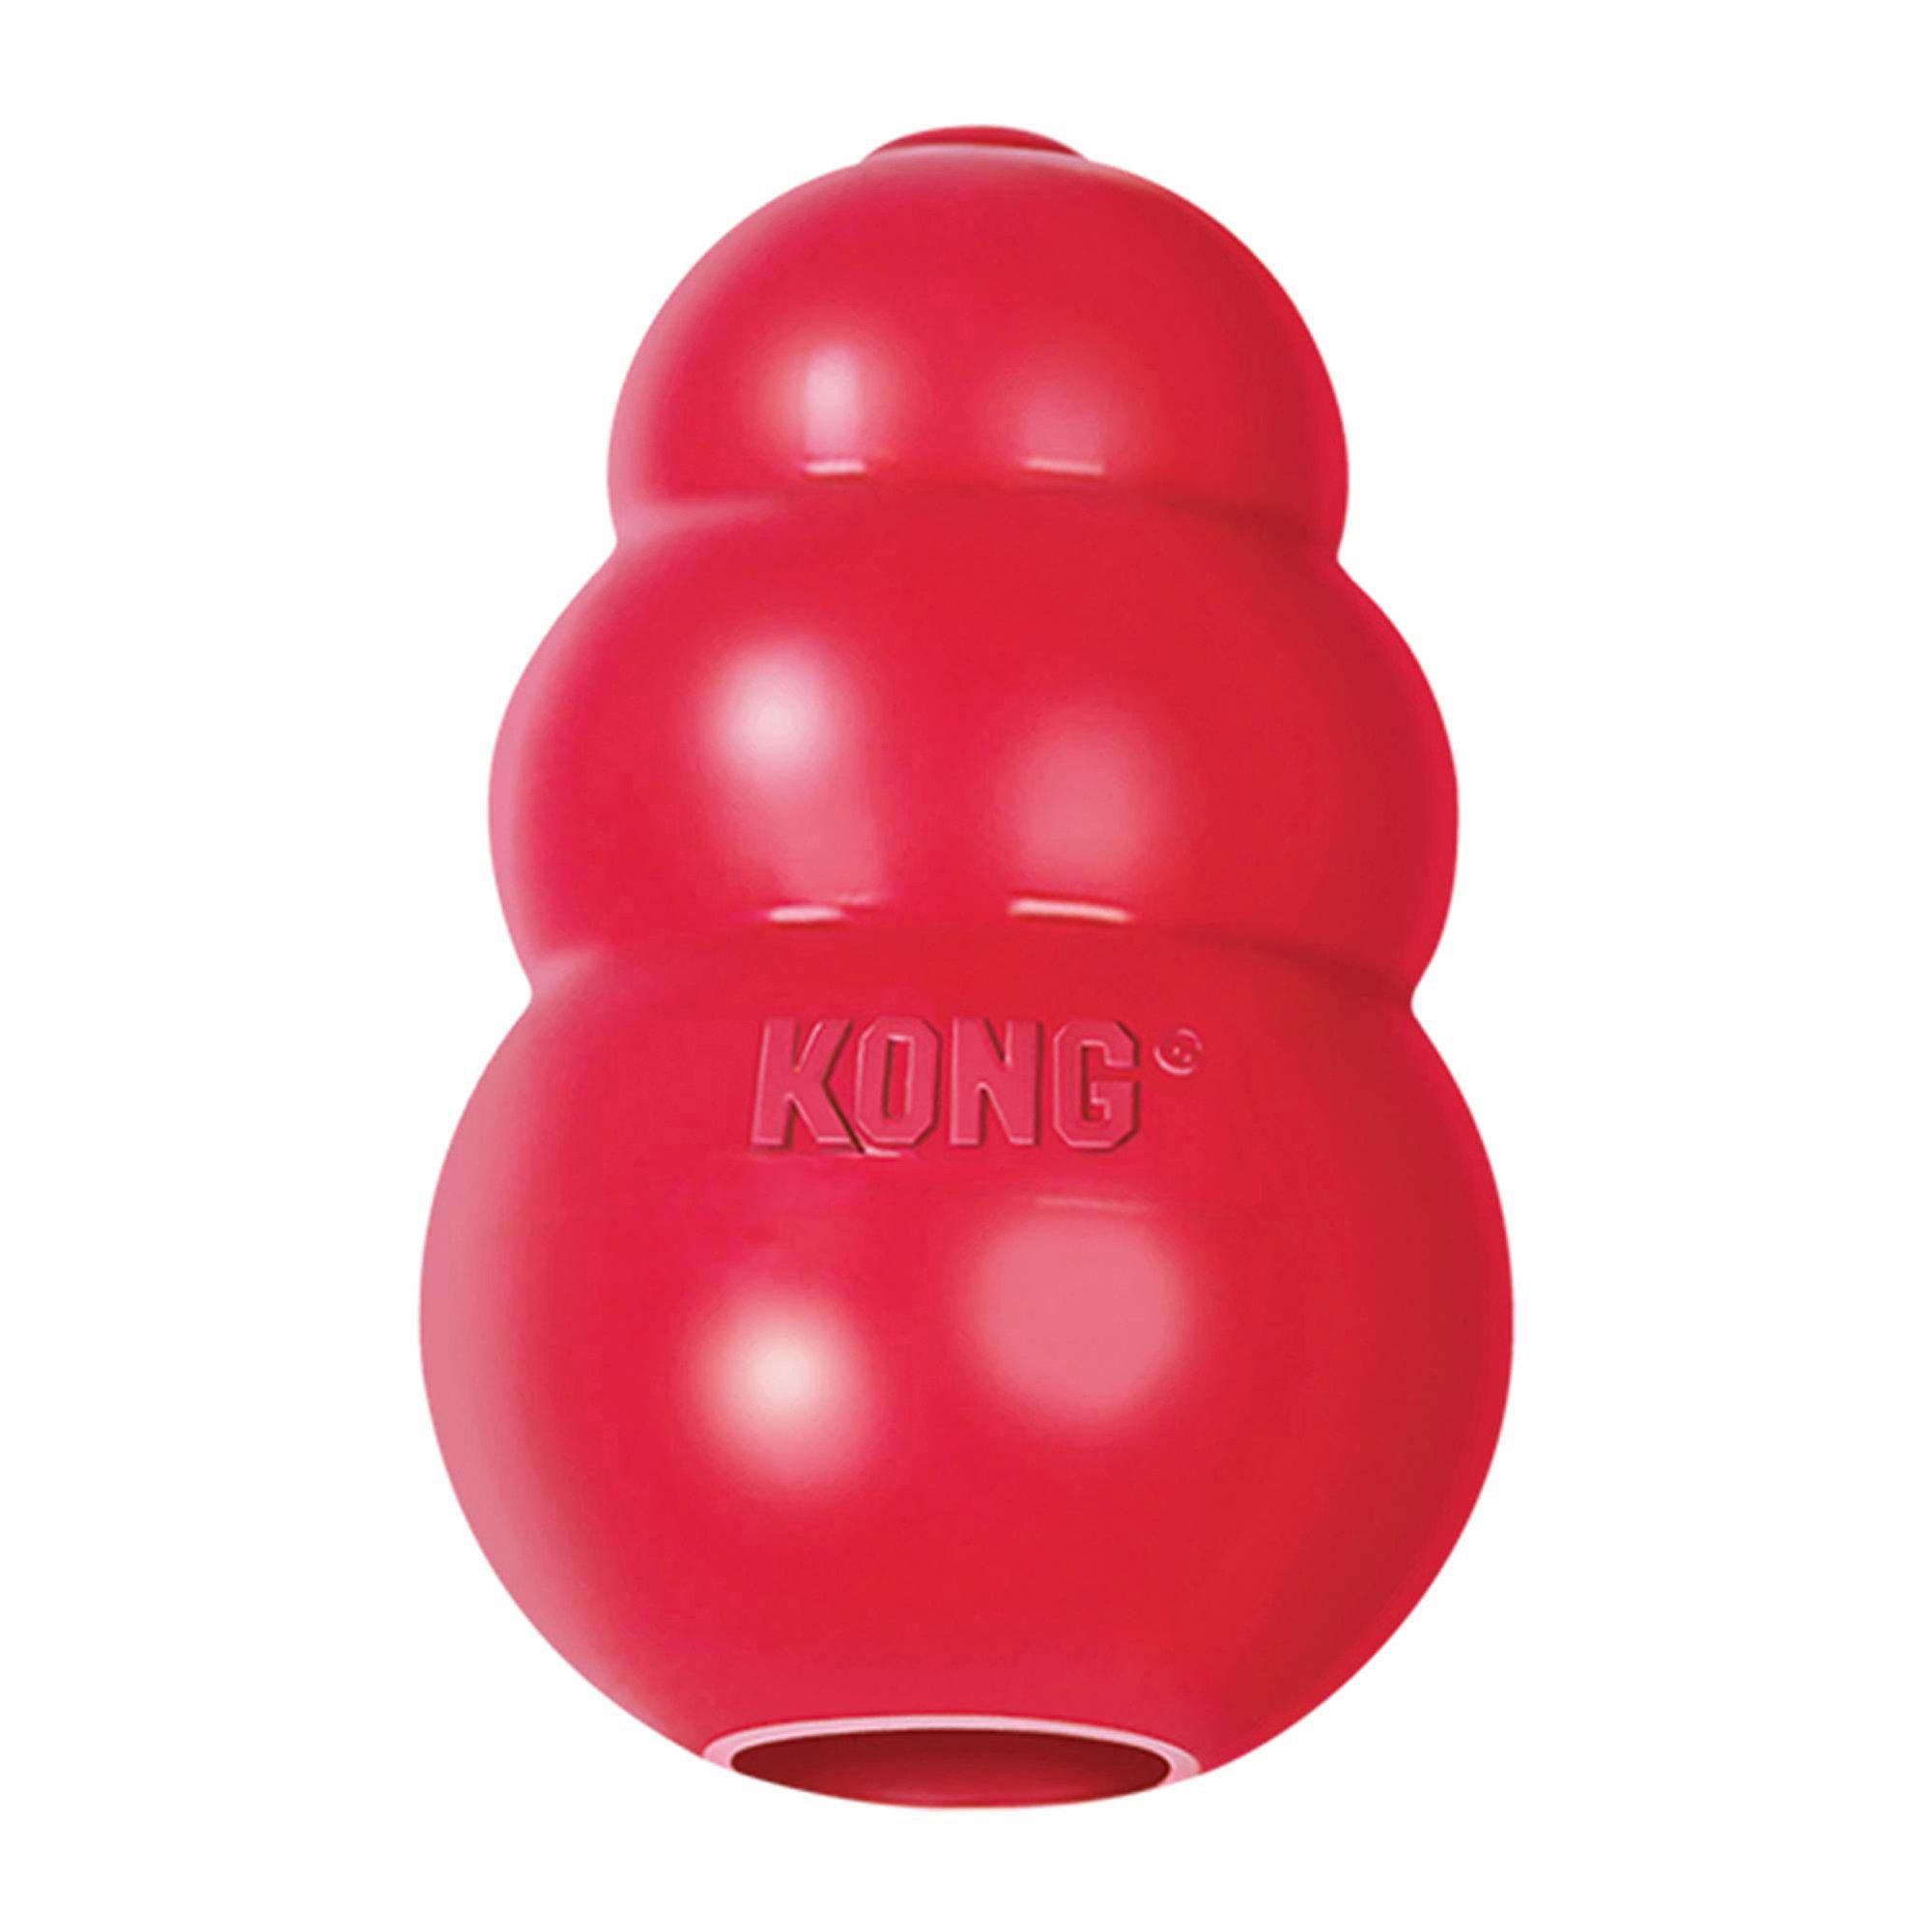 Of Kong Dog Toys